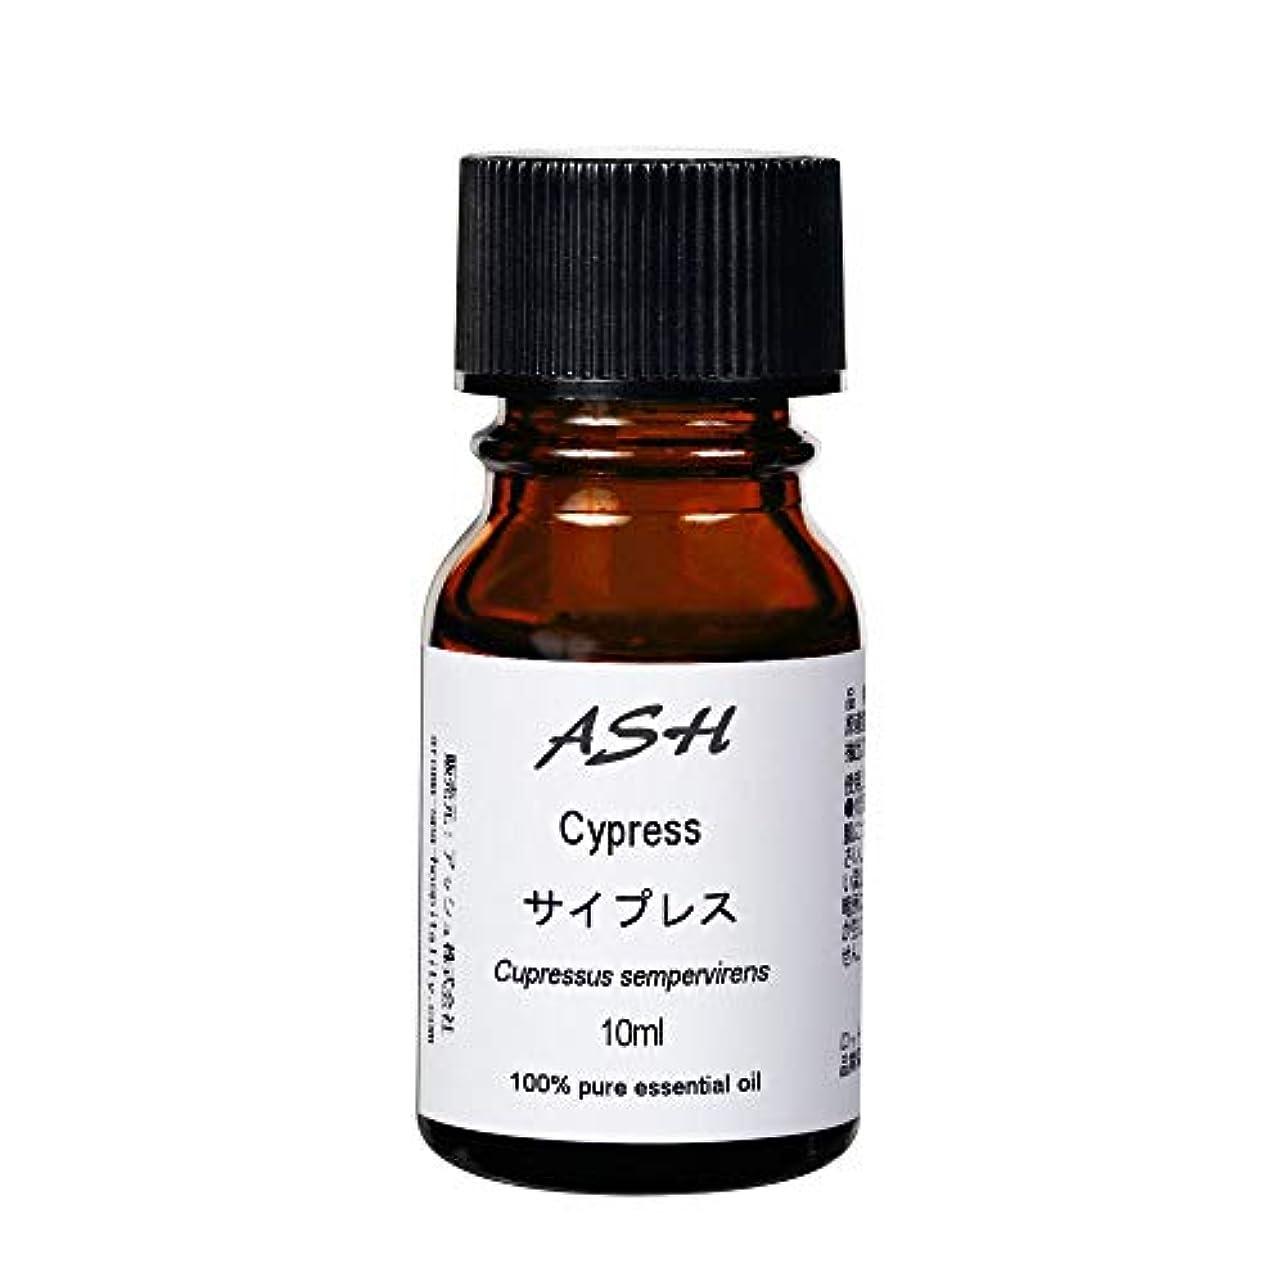 ASH サイプレス エッセンシャルオイル 10ml AEAJ表示基準適合認定精油